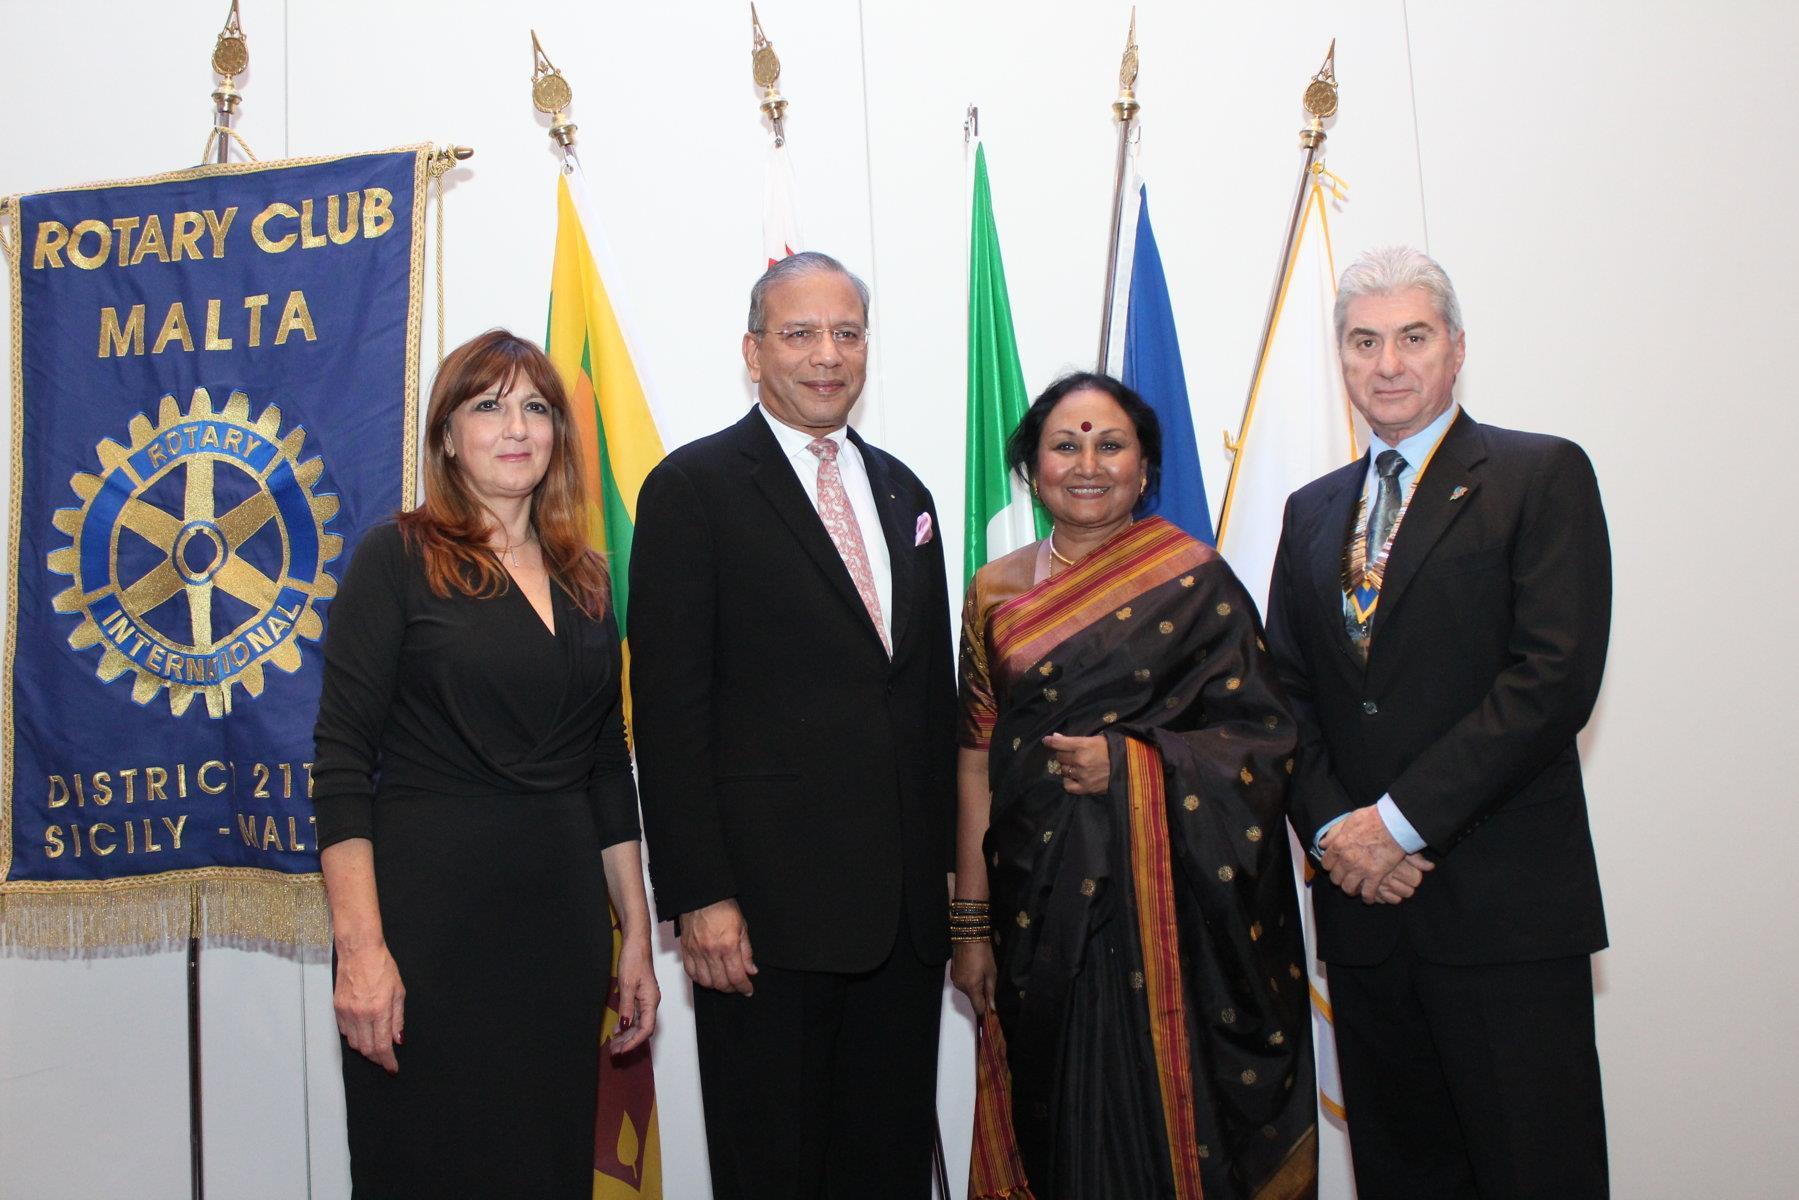 President Ravi with RC Malta President